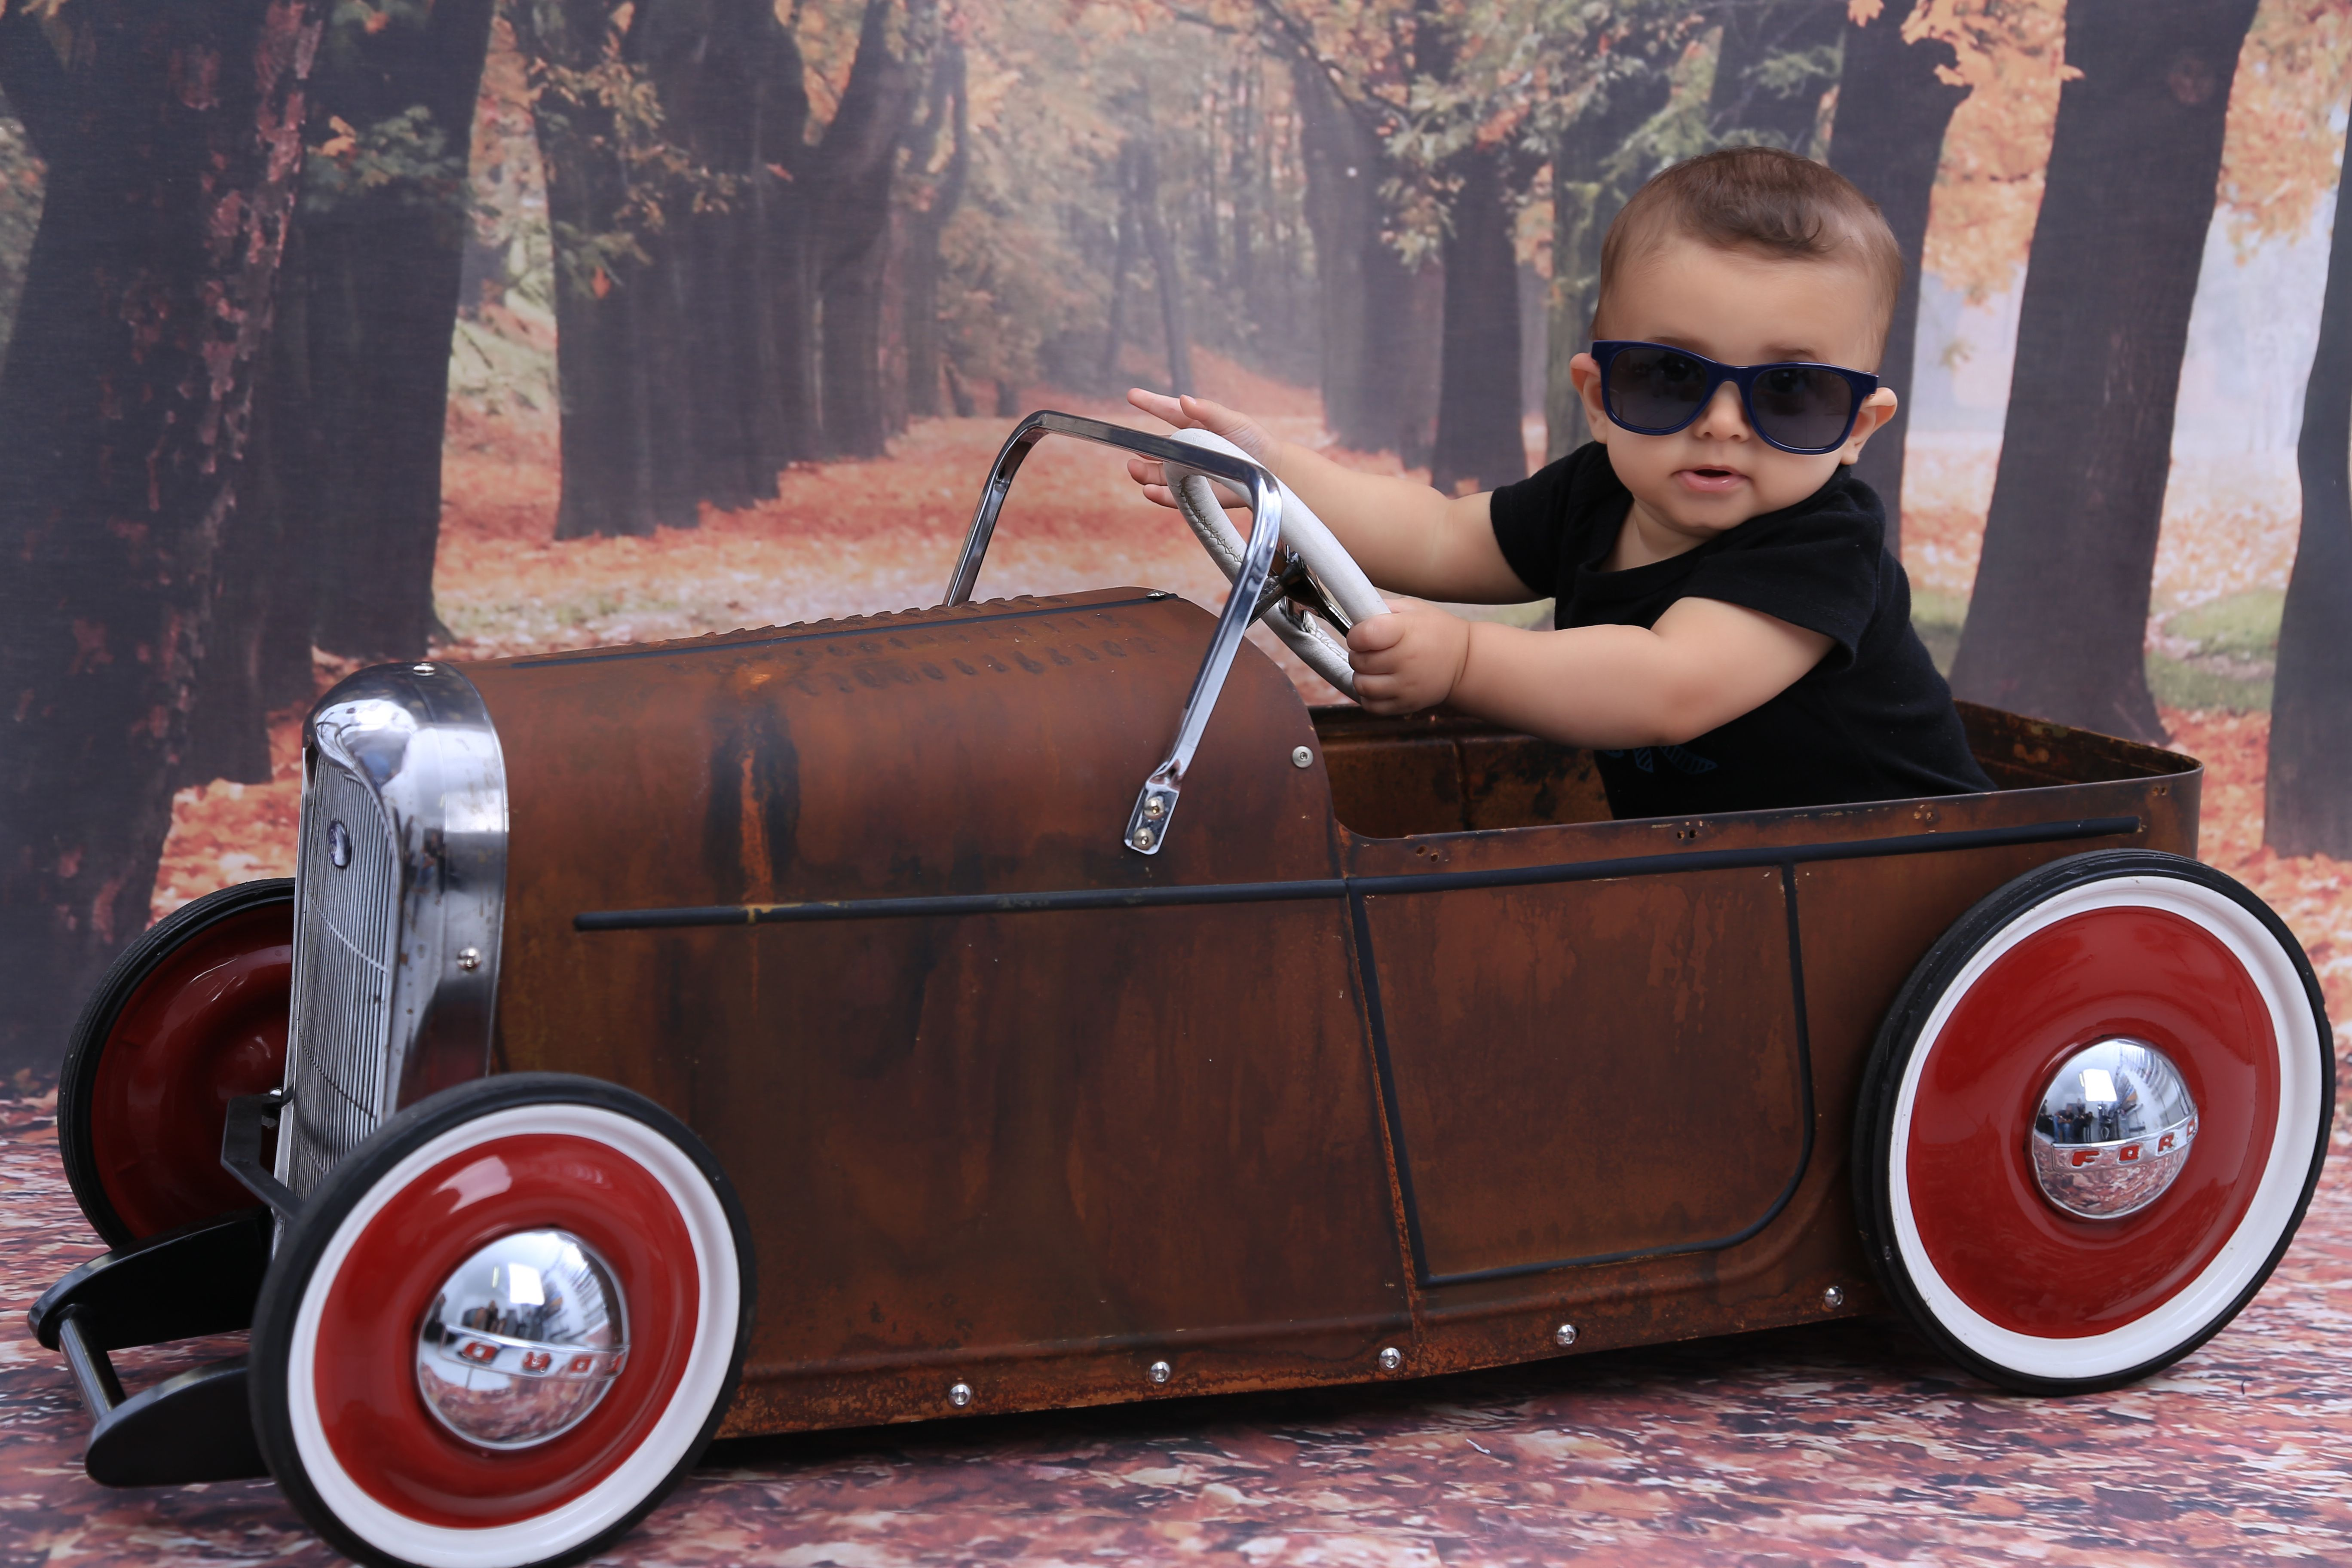 Pedal Cars Hot Rod Vintage Toys